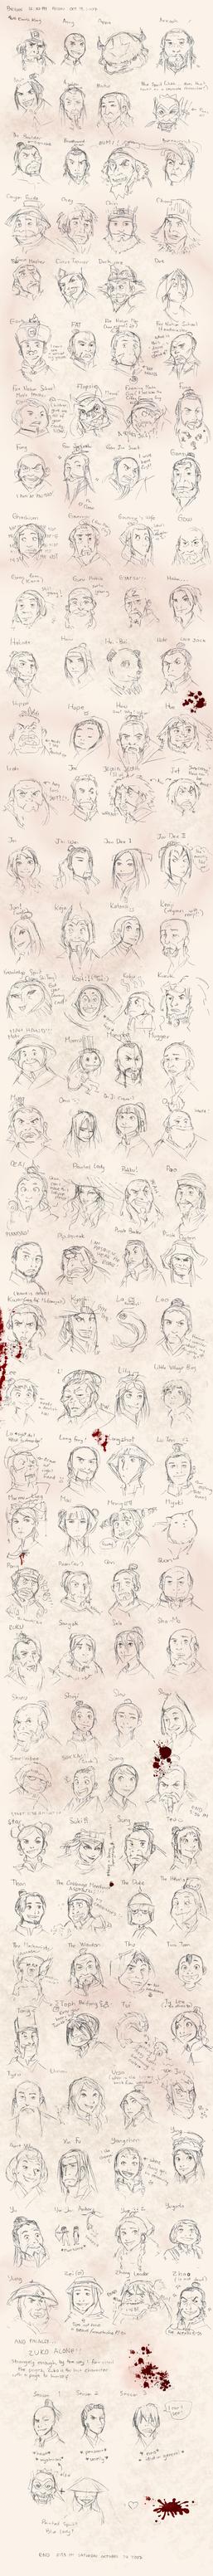 Avatar Character Challenge by Kursunada